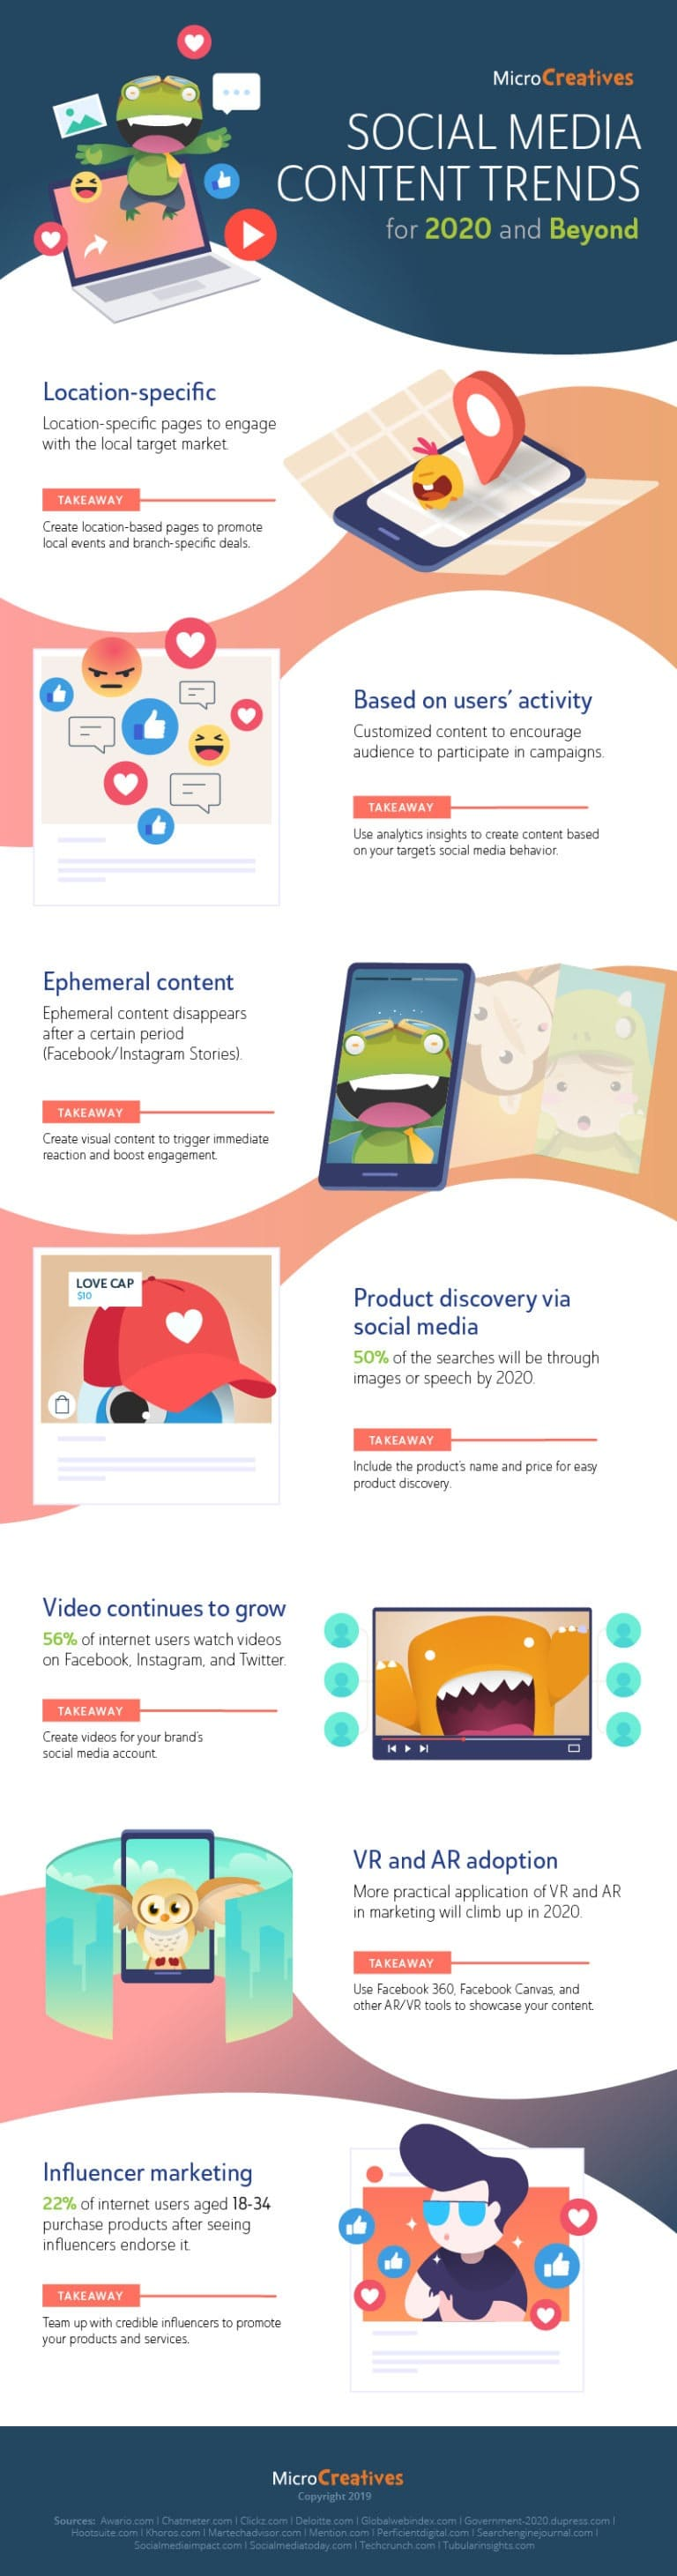 contenuti social media tendenze 2020 infografica